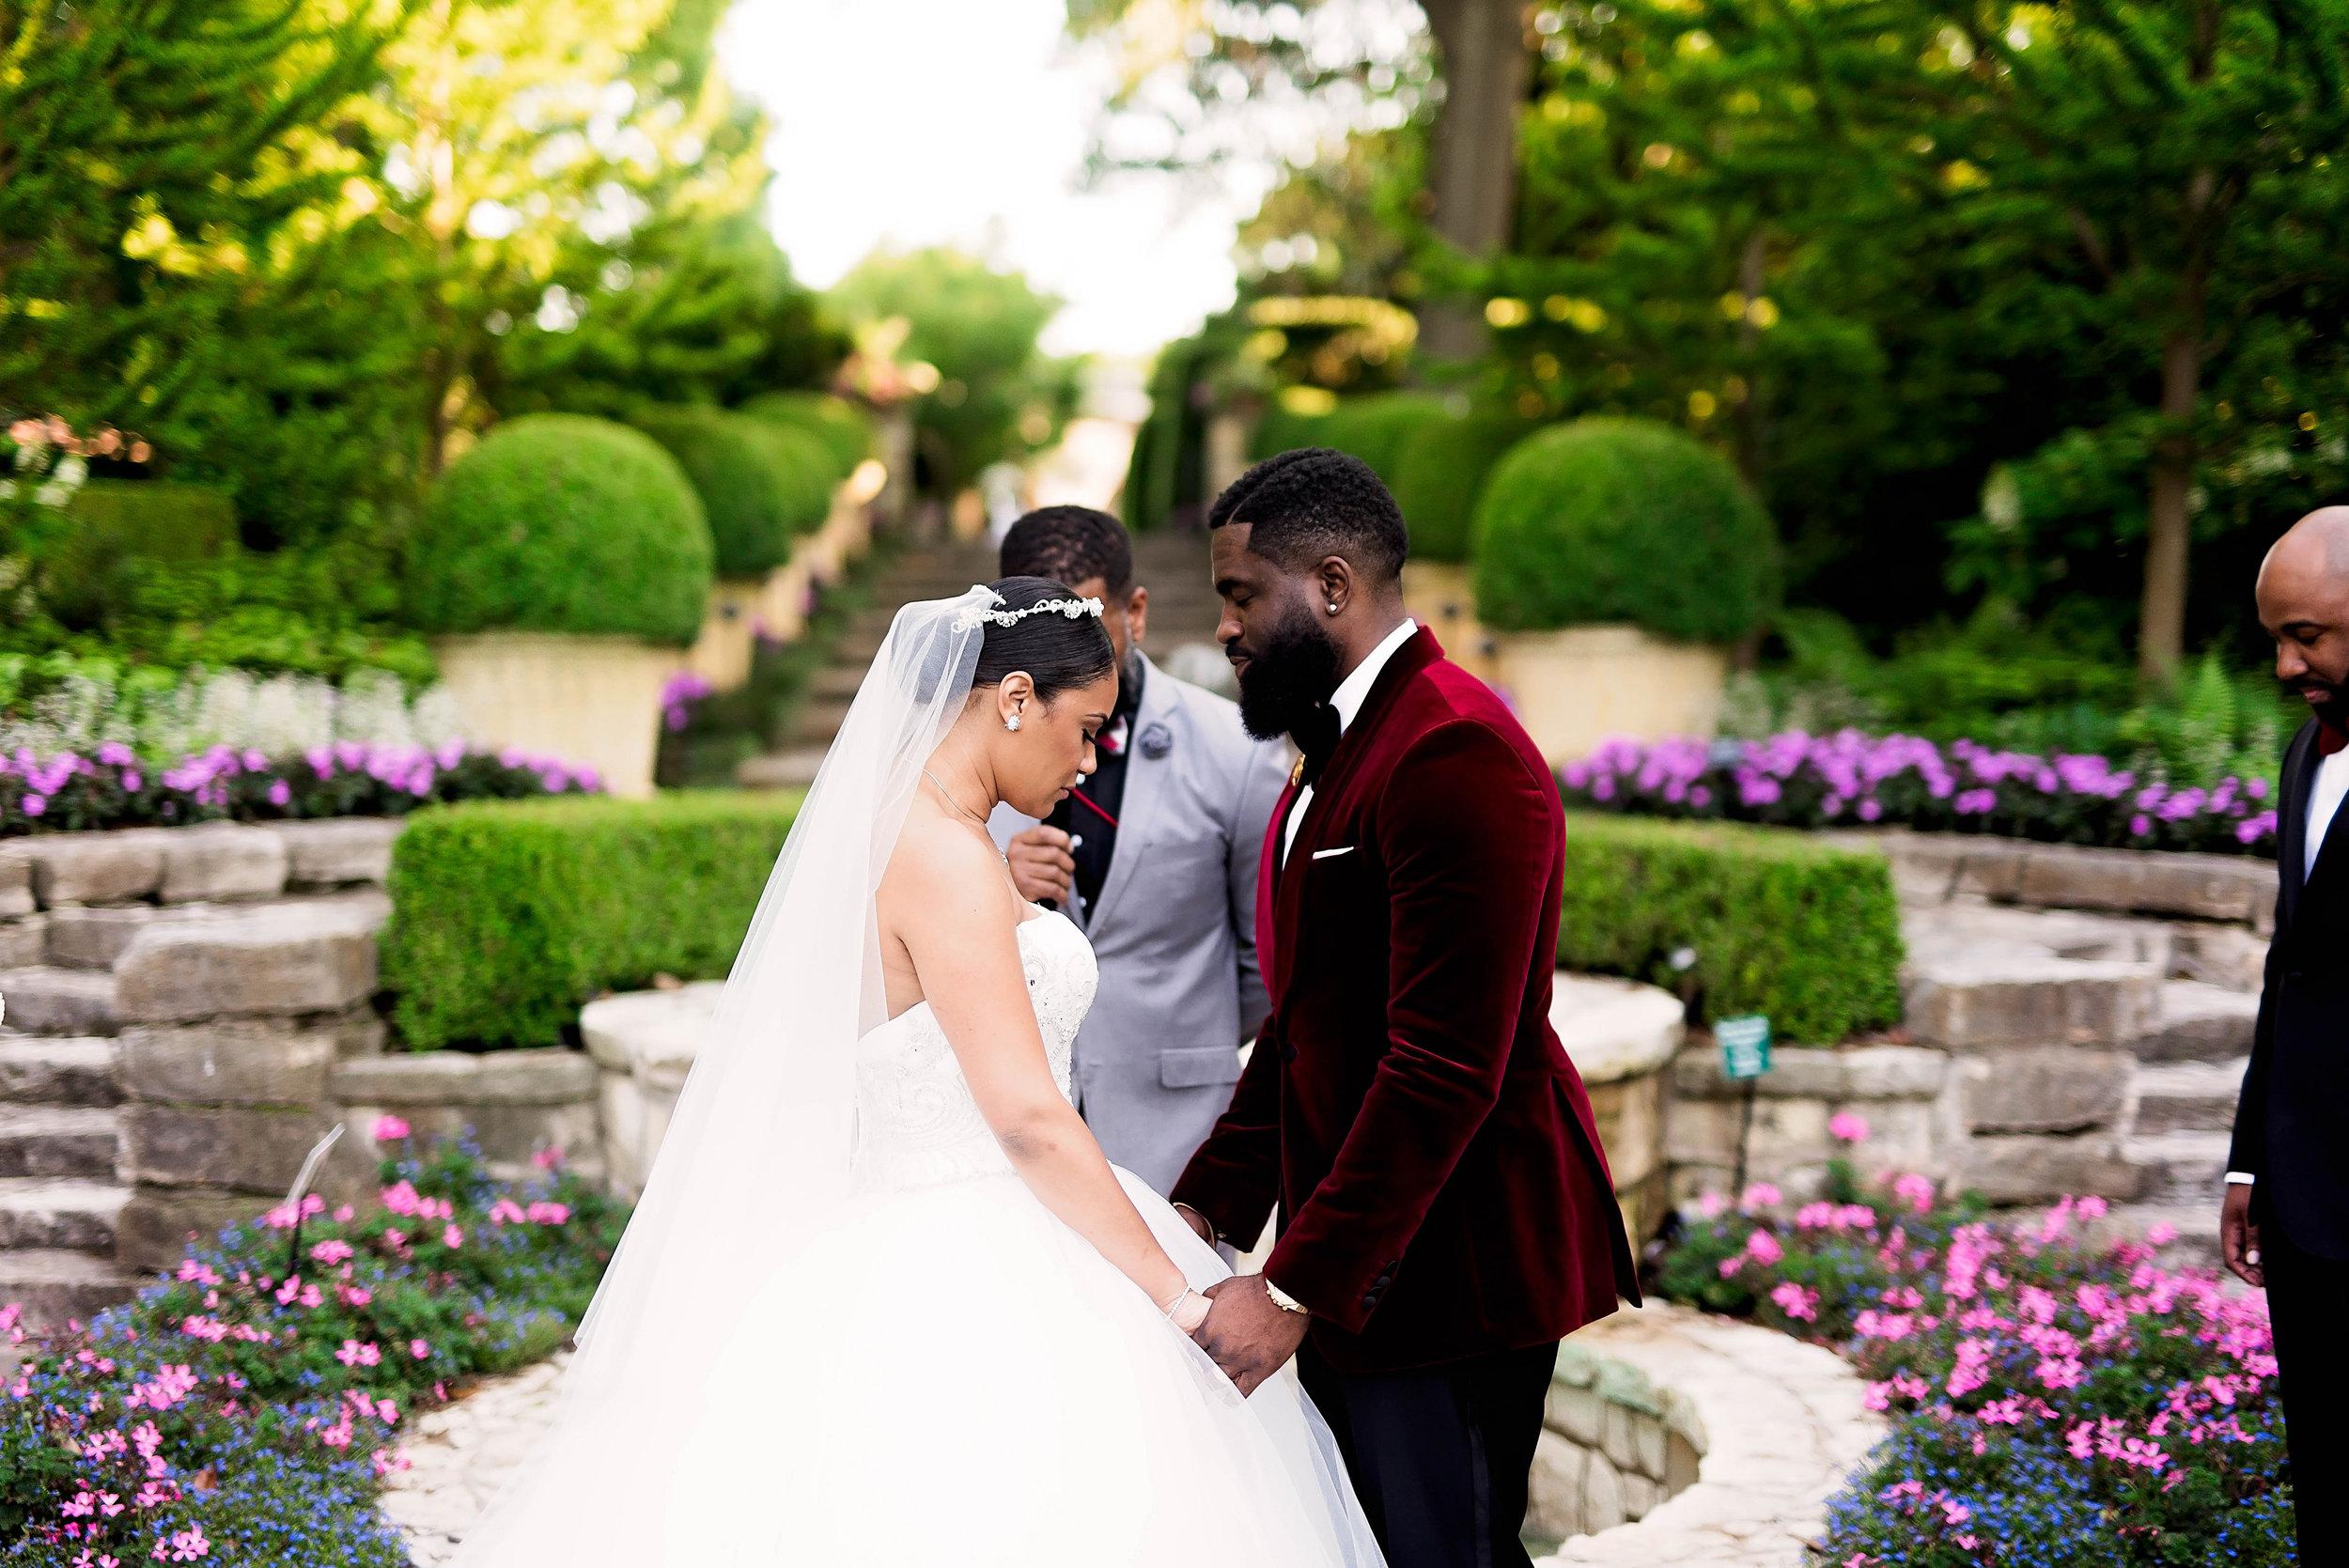 Kerri-Bravion-Wedding-PharrisPhotos-0016.jpg